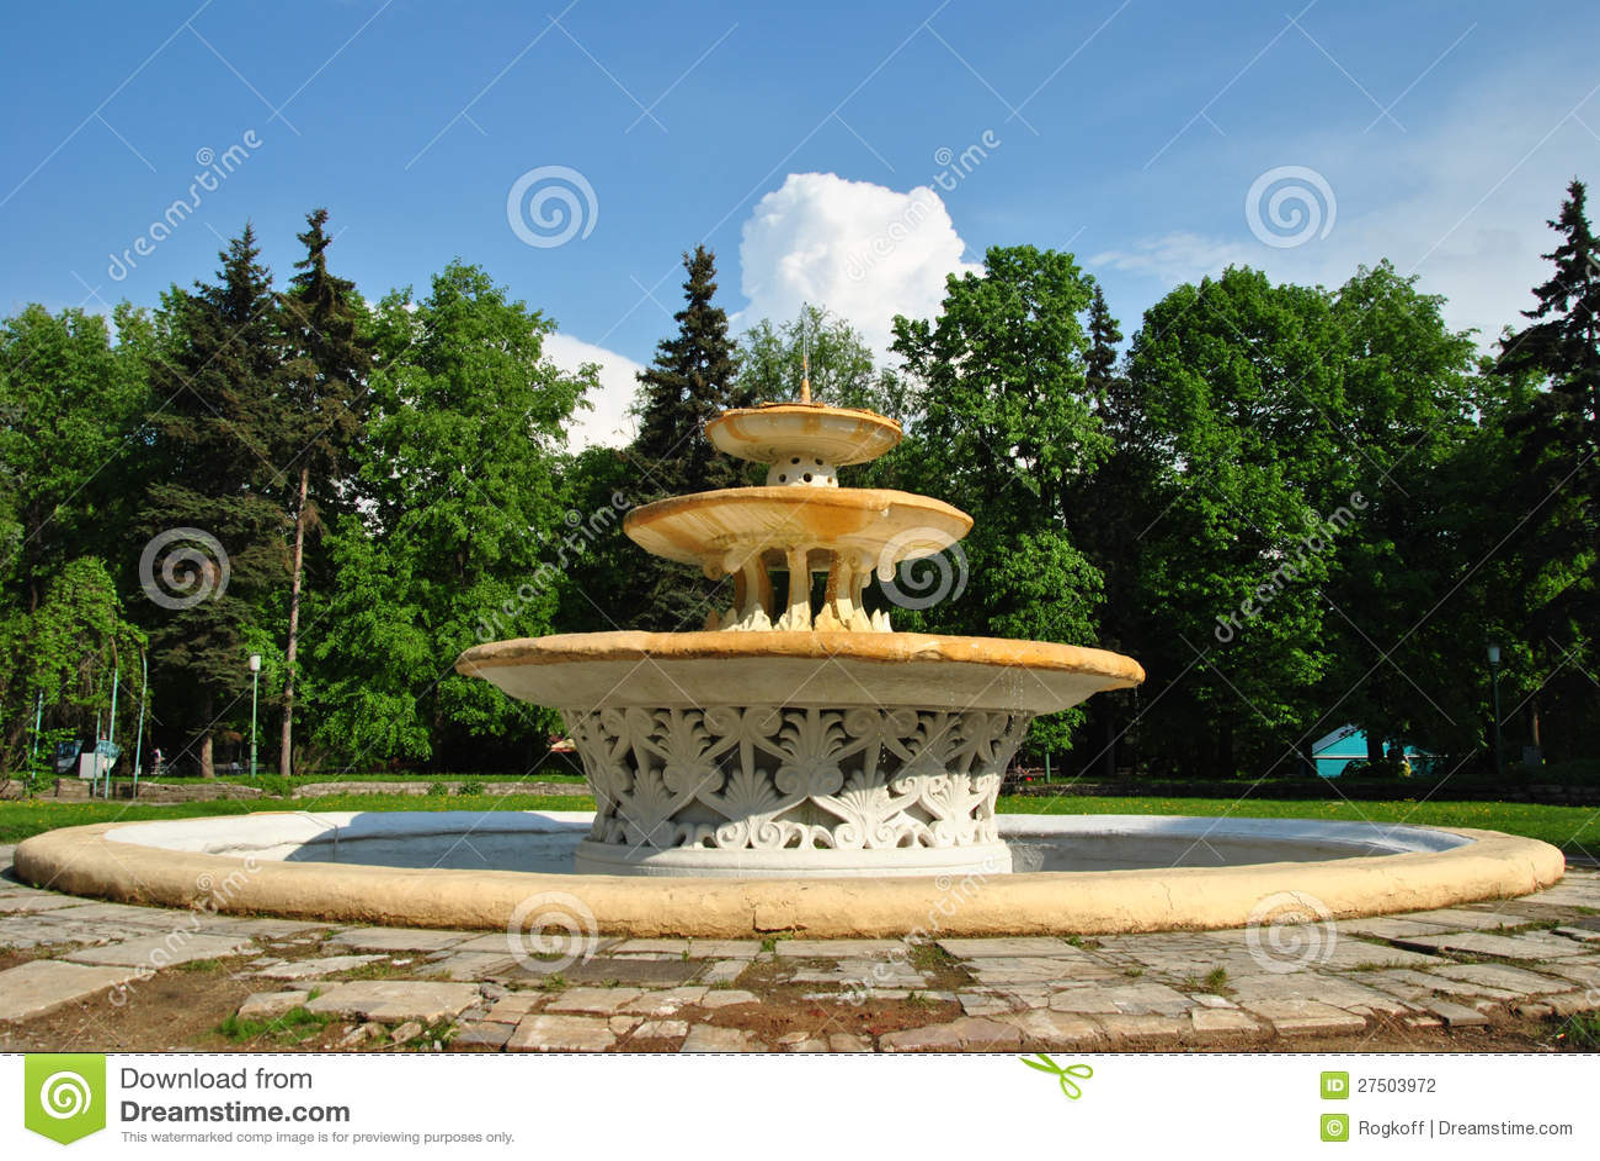 Une belle fontaine avec une piscine ronde photographie for Fontaine piscine